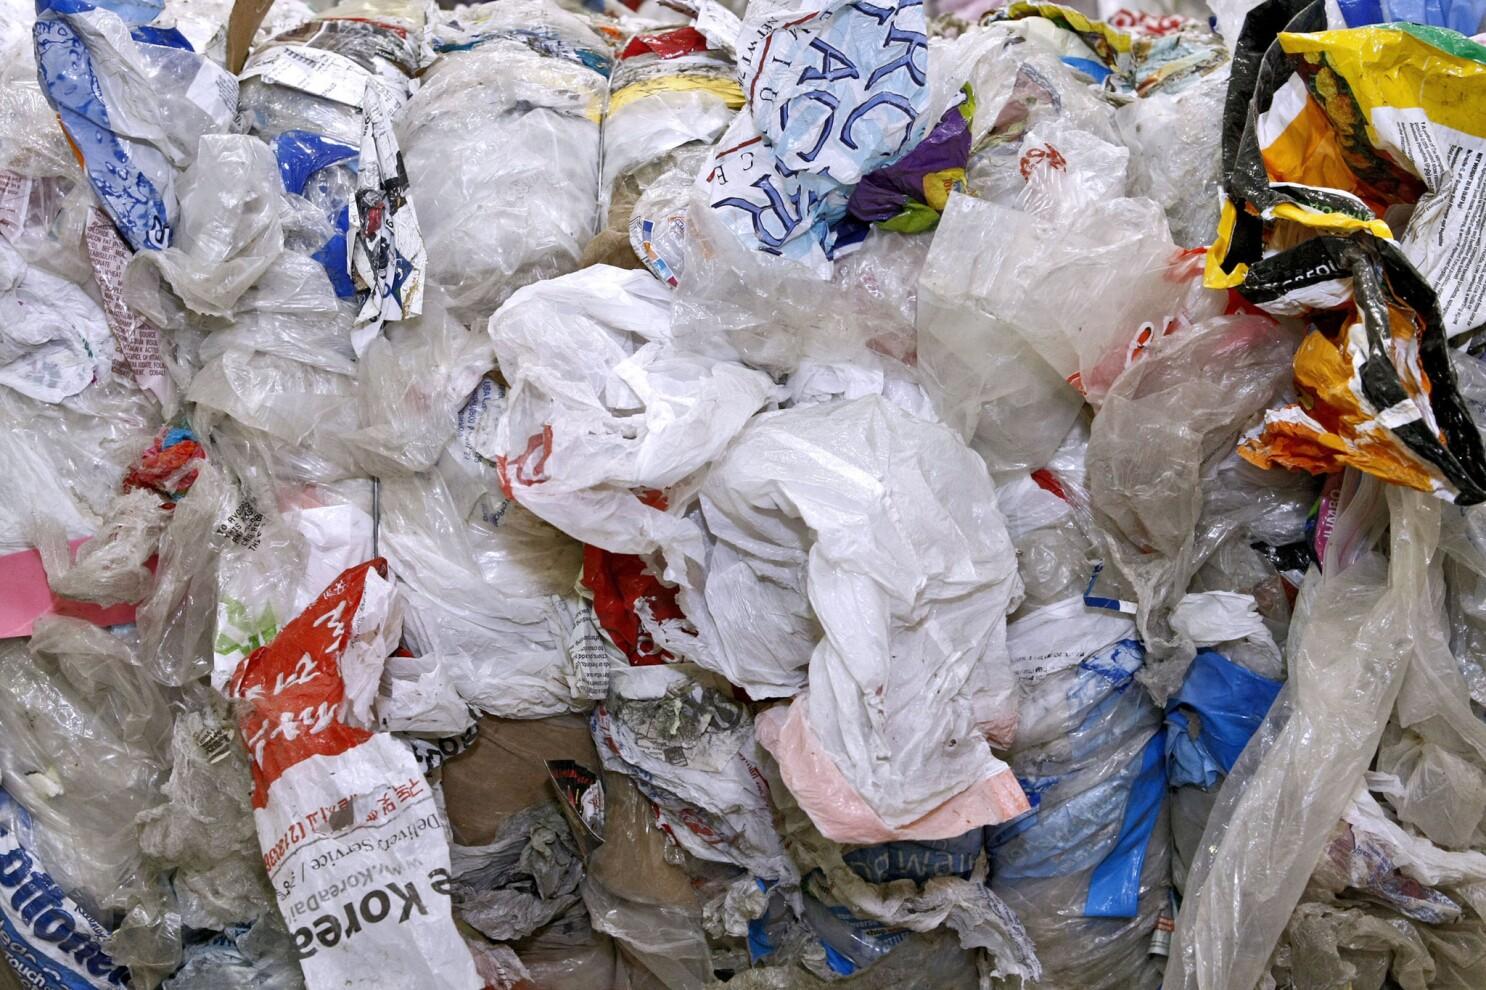 Burbank Recycling Center >> 818 Roundup Burbank Recycling Center Operators Fined 32 6 Million